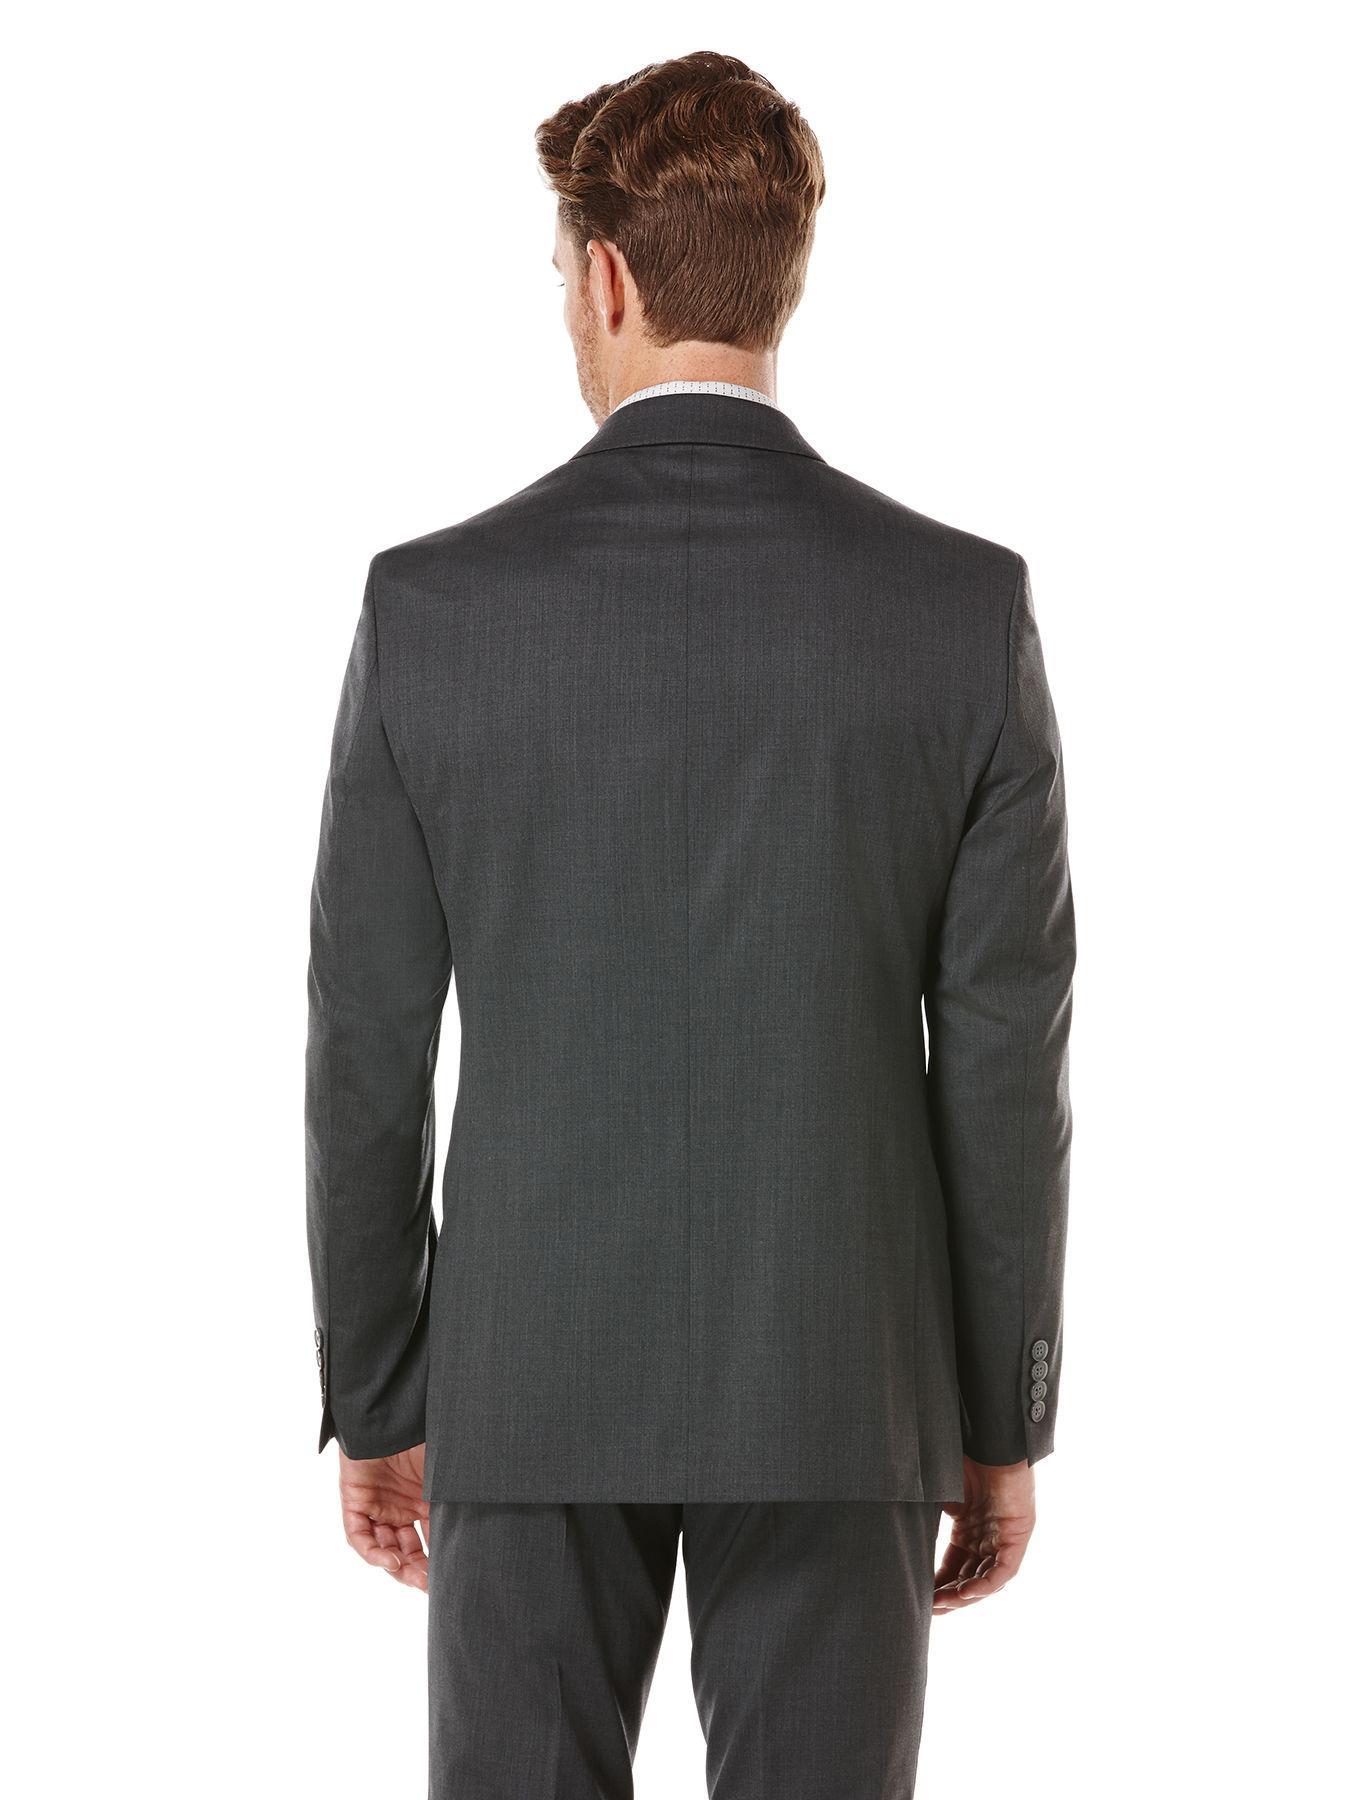 73d8170746 Perry Ellis - Black Charcoal Solid Suit Jacket for Men - Lyst. View  fullscreen